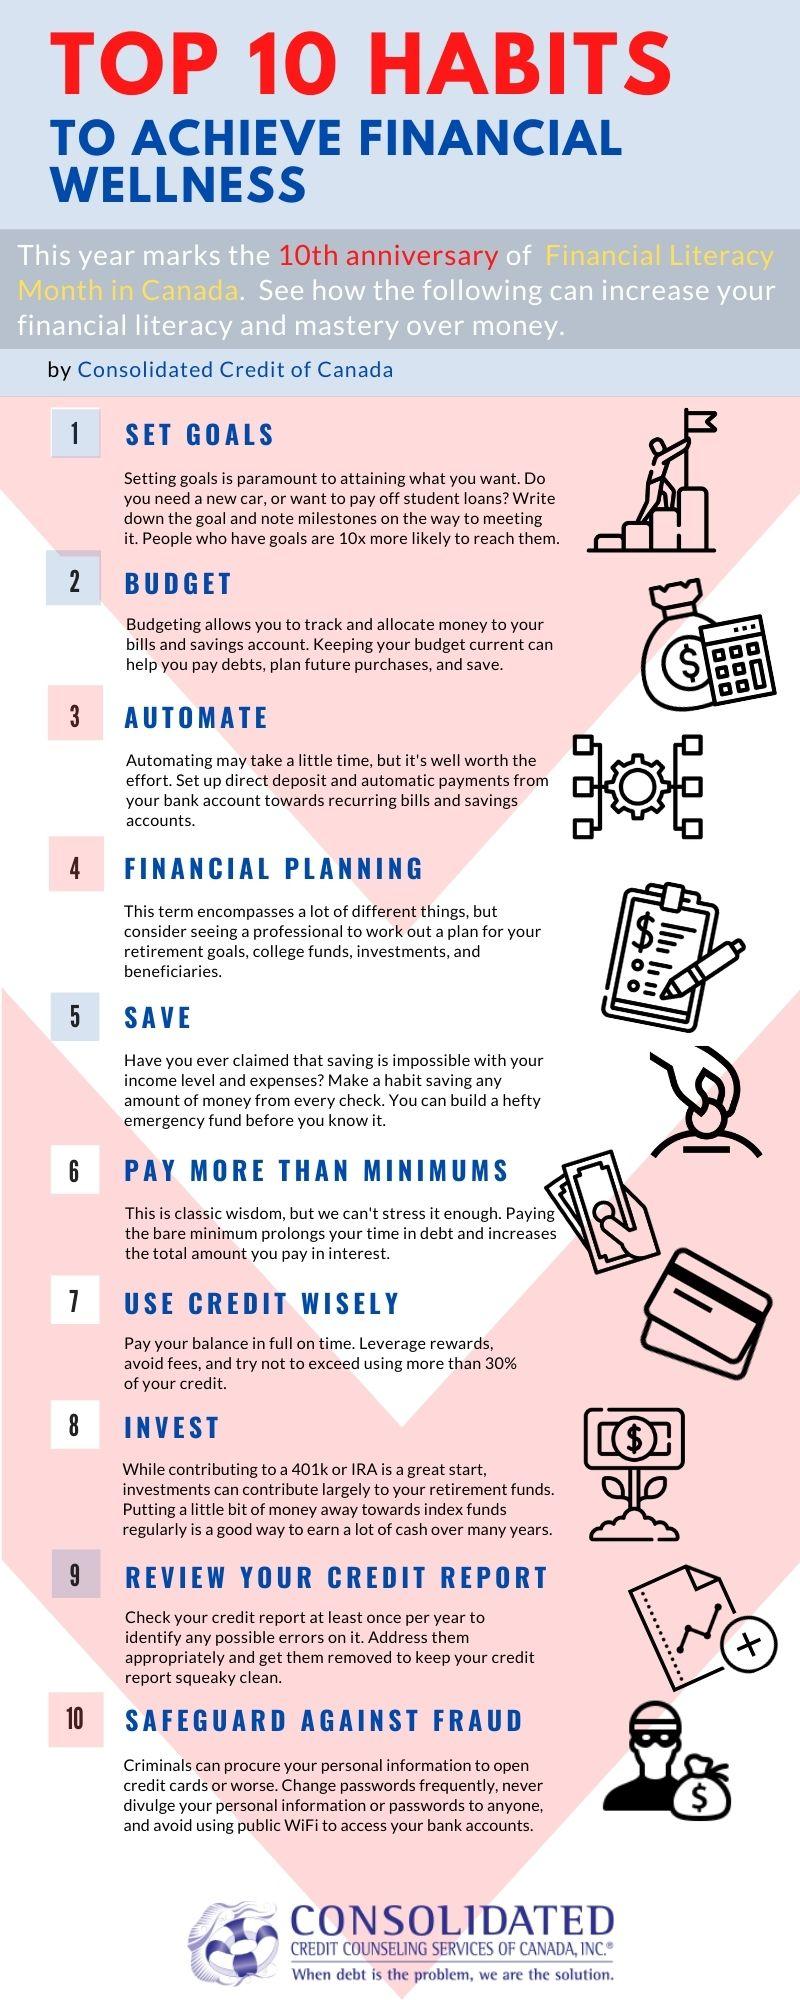 Financial Literacy Best Practices